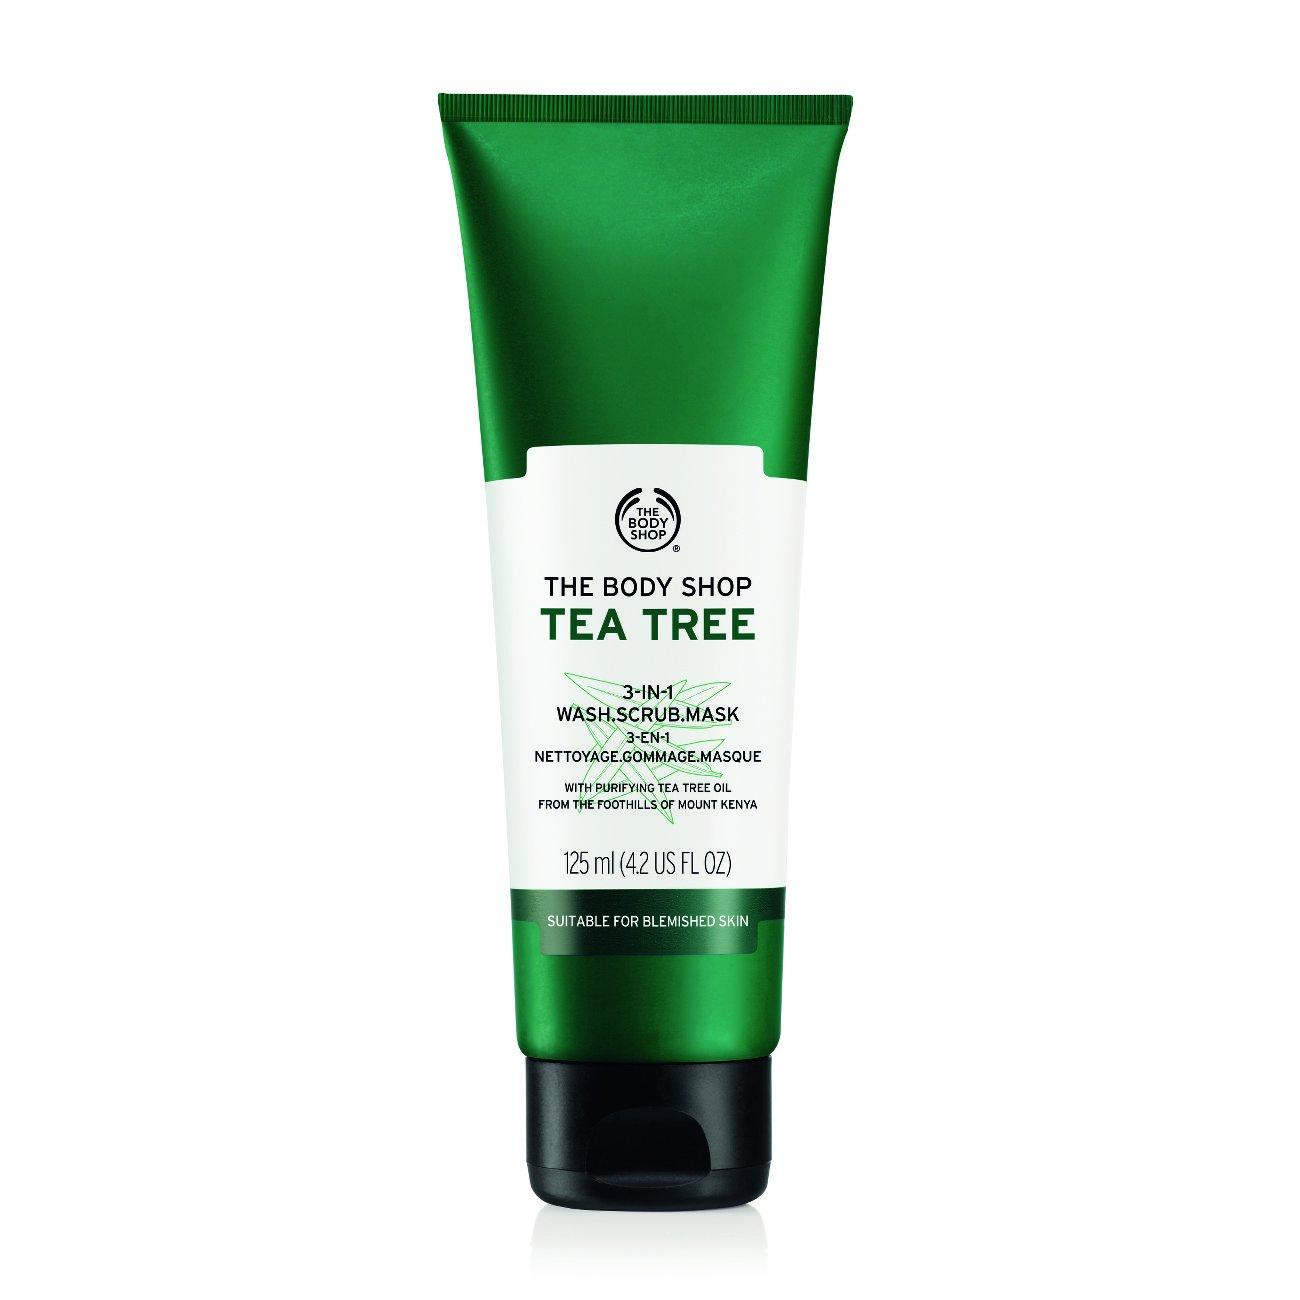 Amazoncom  The Body Shop Tea Tree In WashScrubMask Made - Us zip code kml